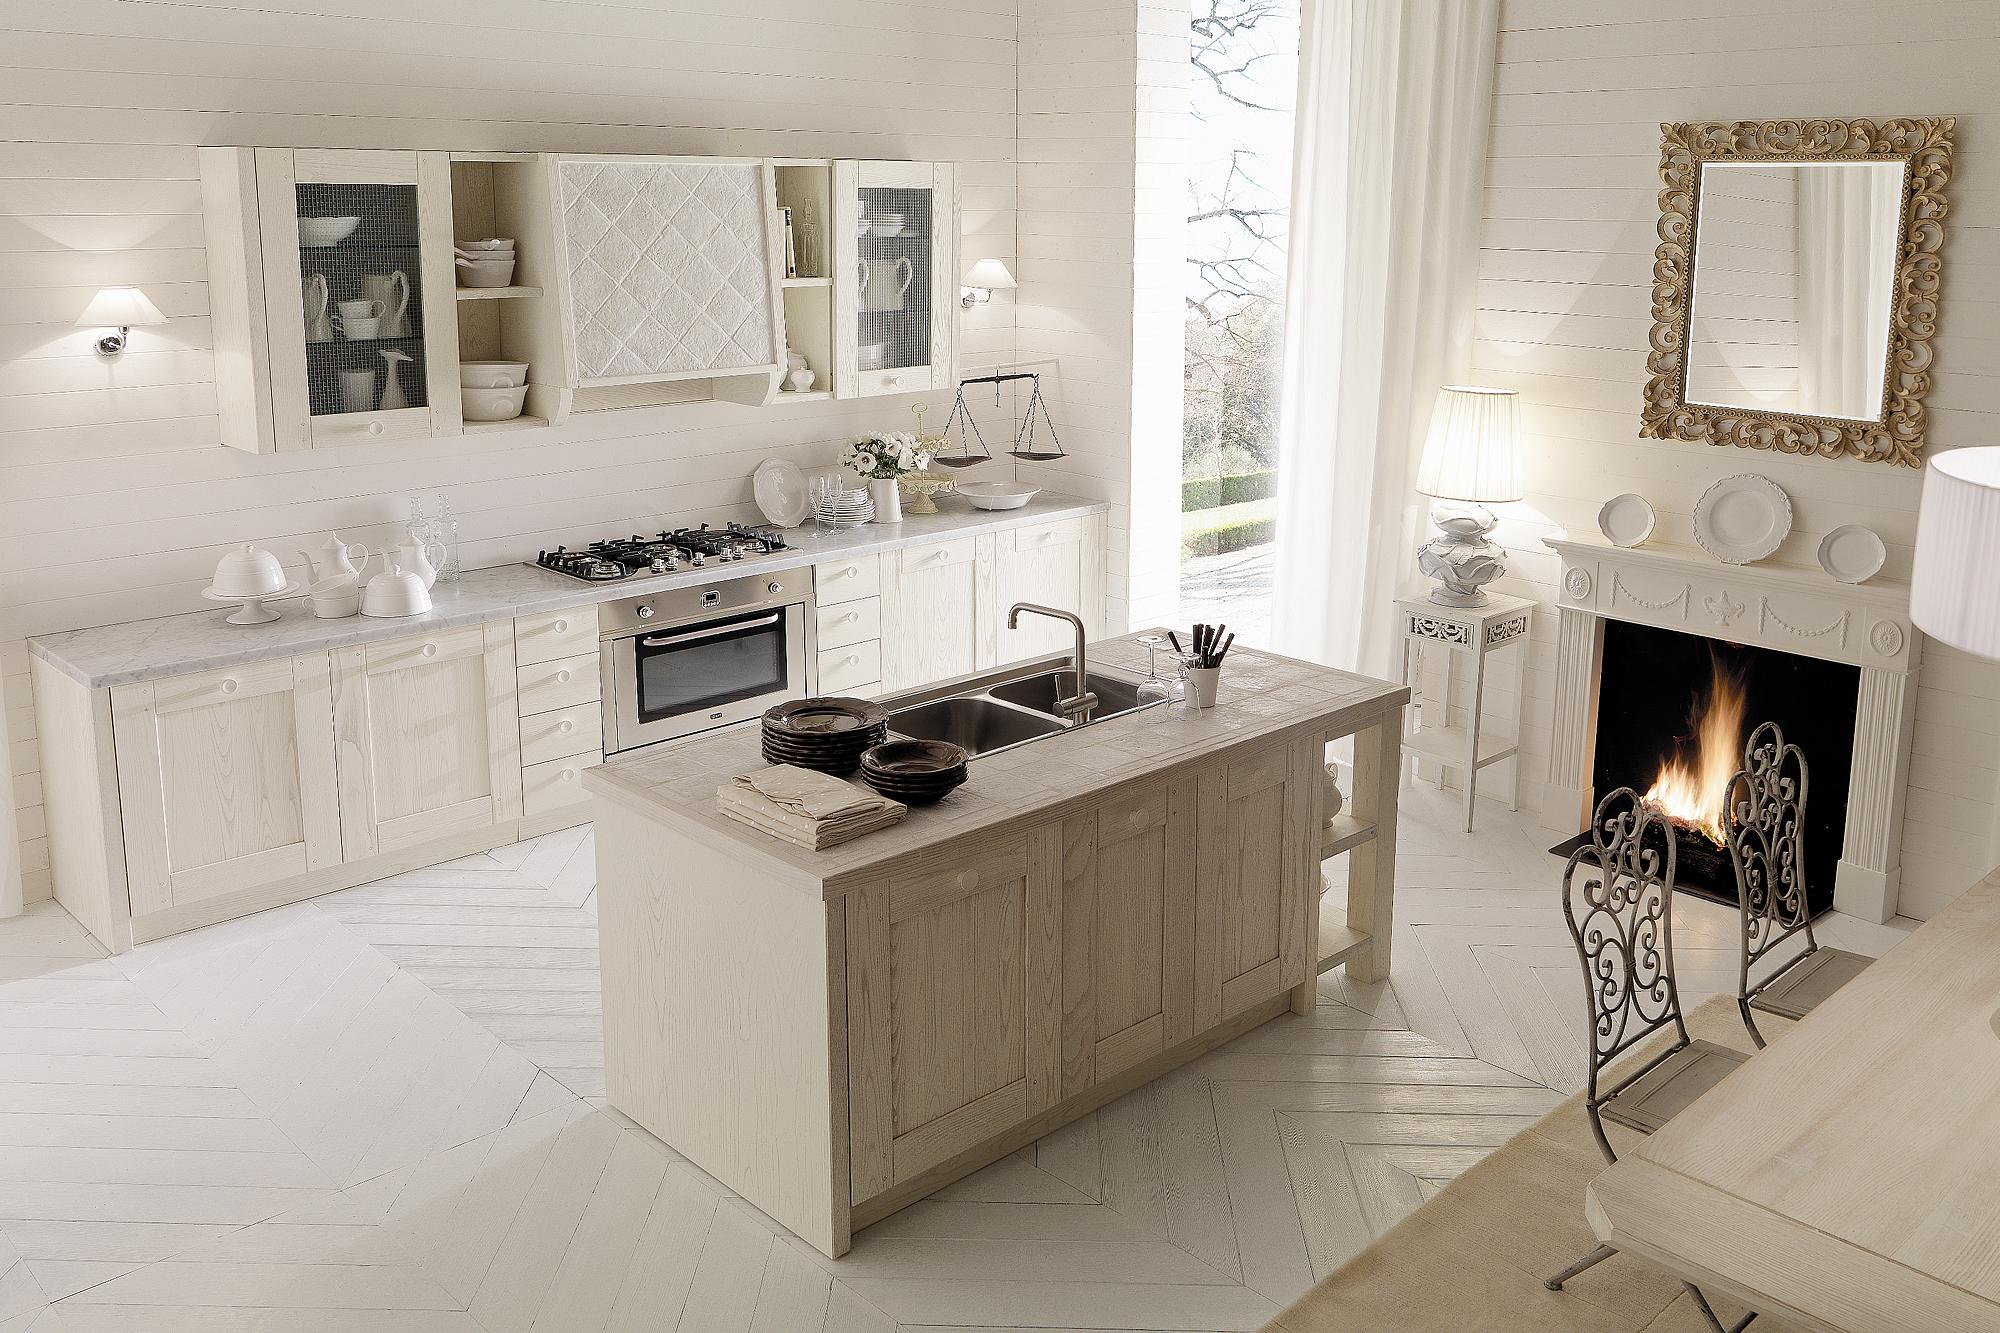 Cucine bianche country chic in muratura cucine in legno massello rustiche empoli firenze - Accessori cucina country ...